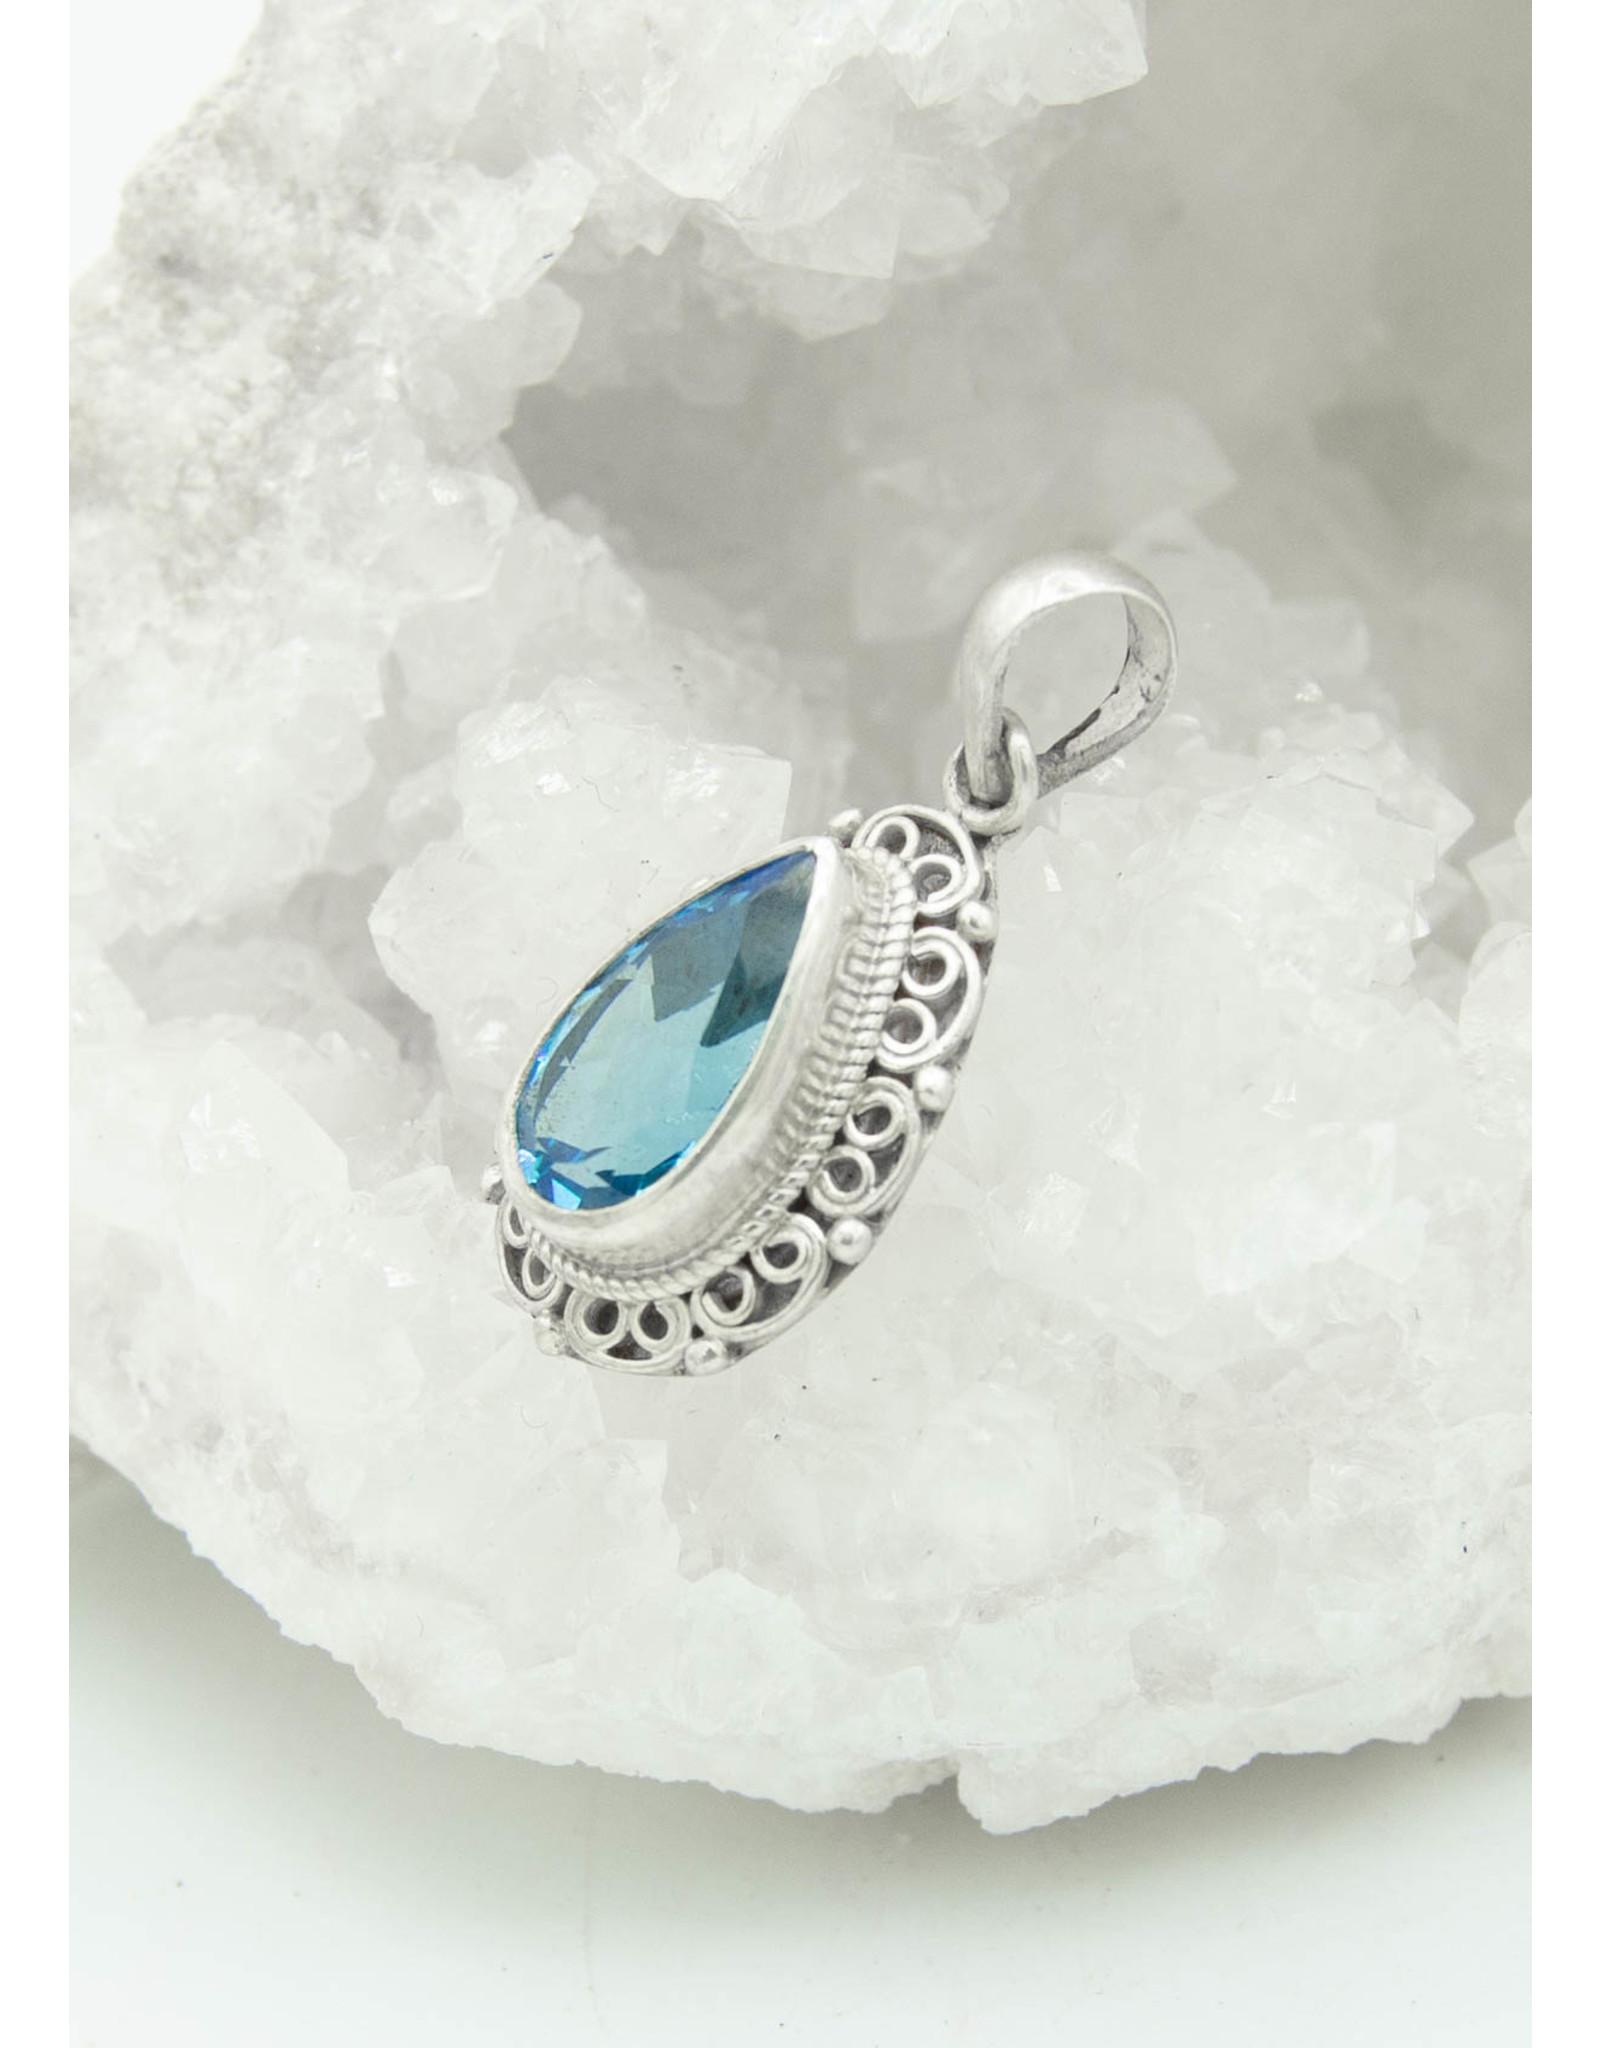 Blue Topaze Pendant